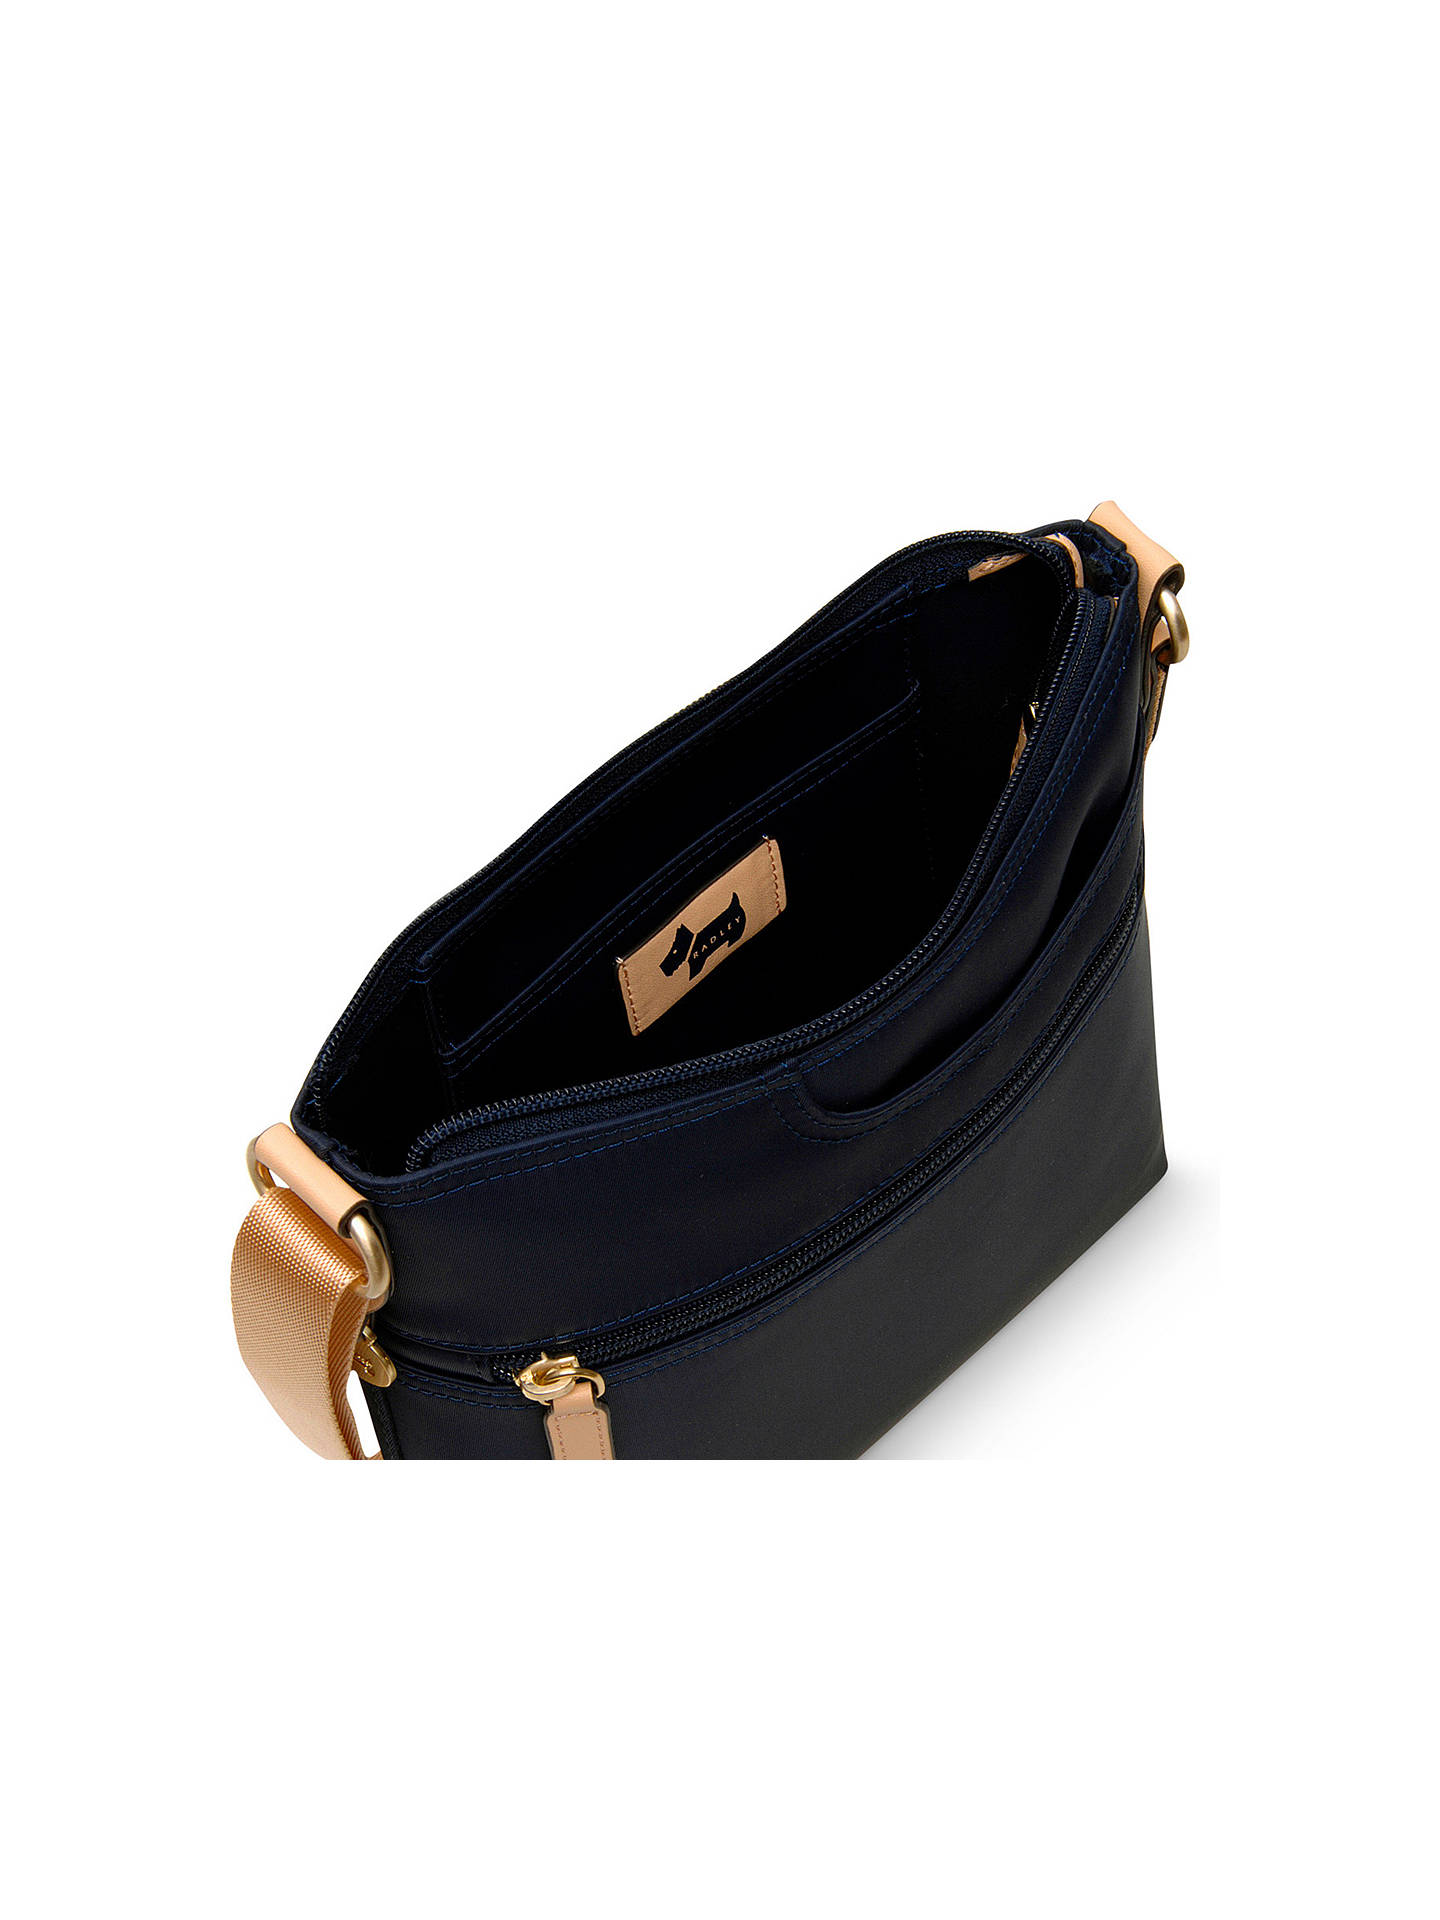 091effc592 Radley Pocket Essentials Fabric Small Cross Body Bag at John Lewis ...